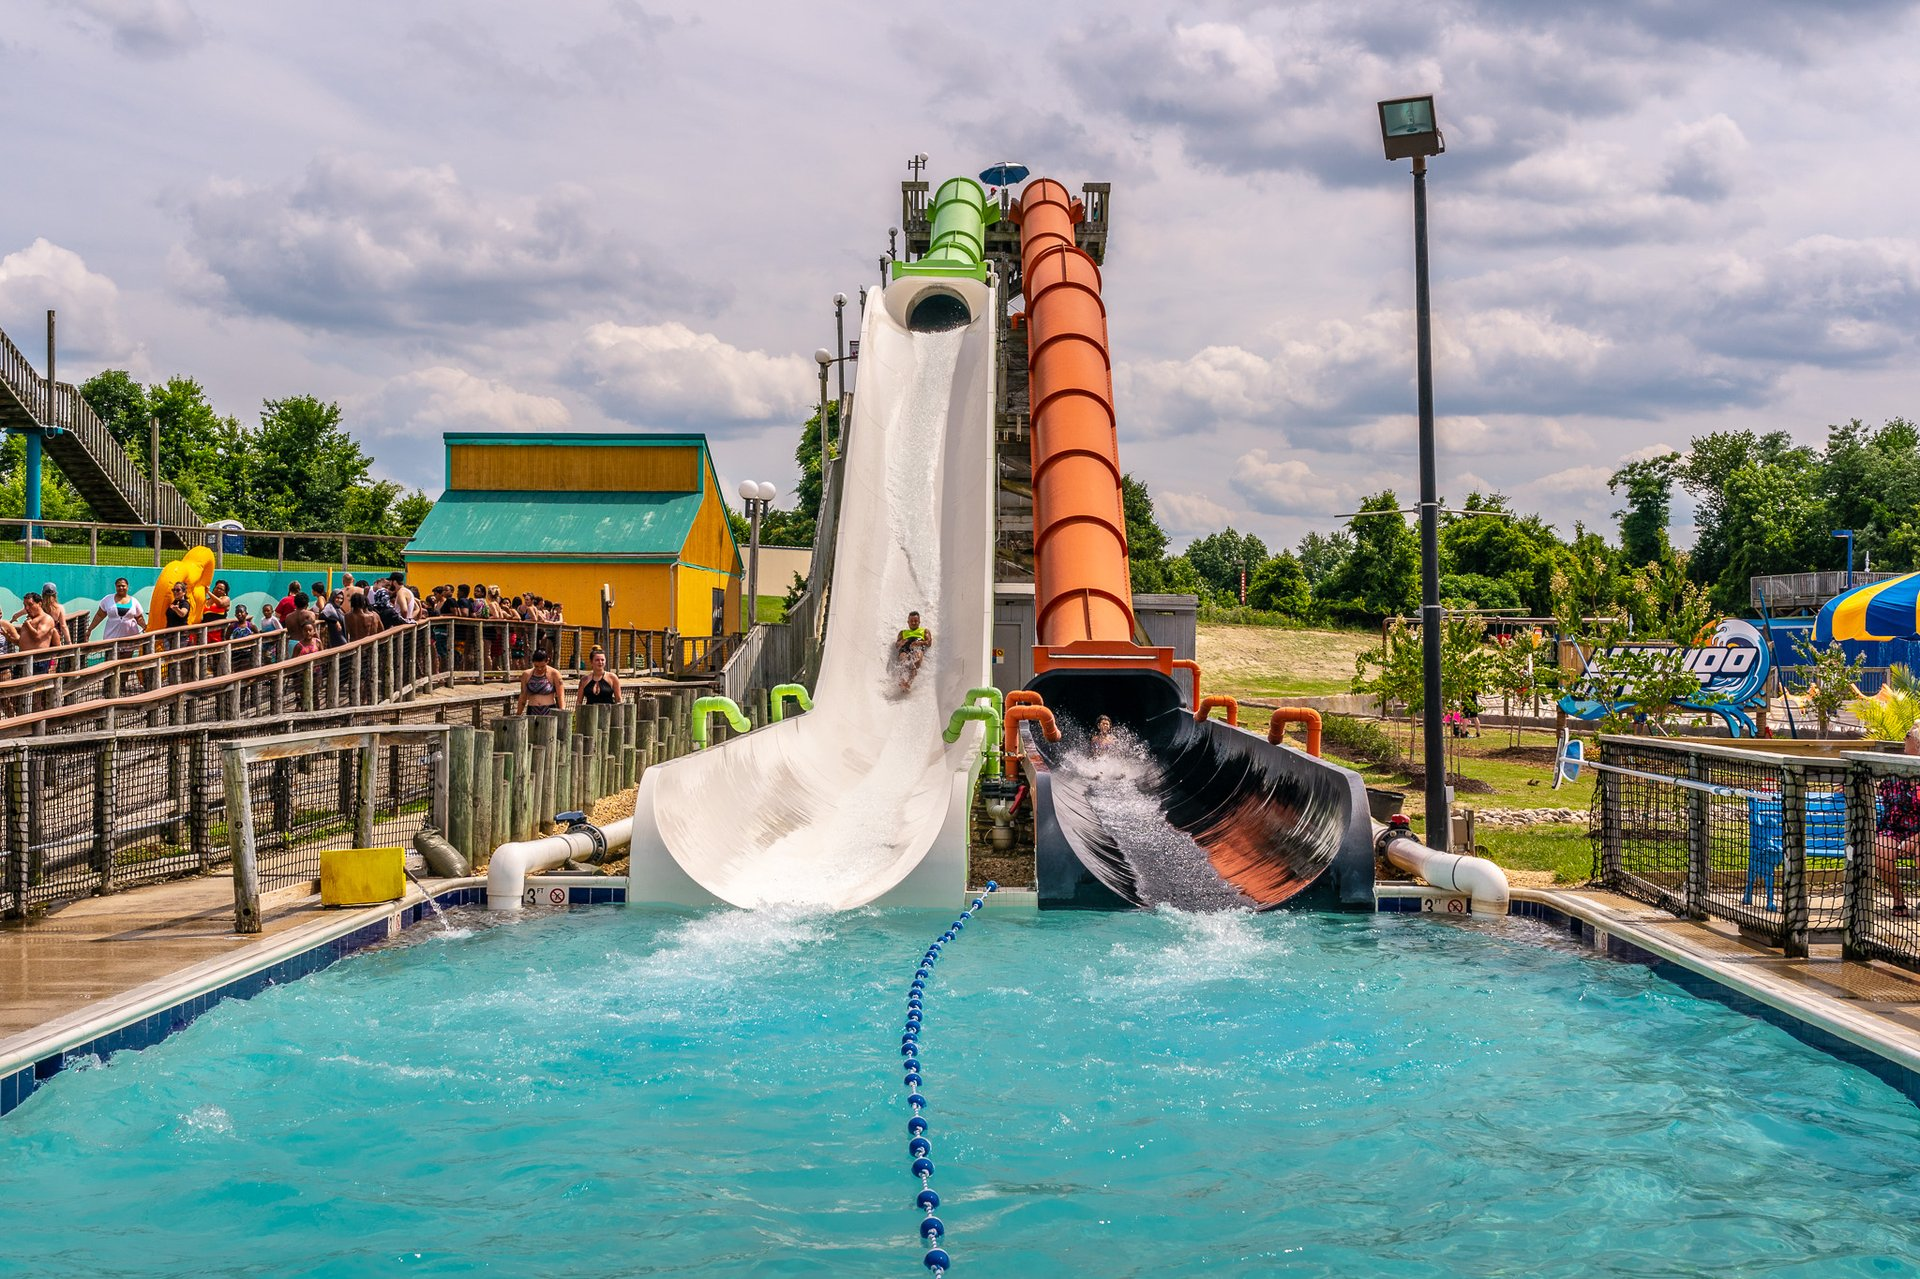 Shark Attack riders splashing into pool